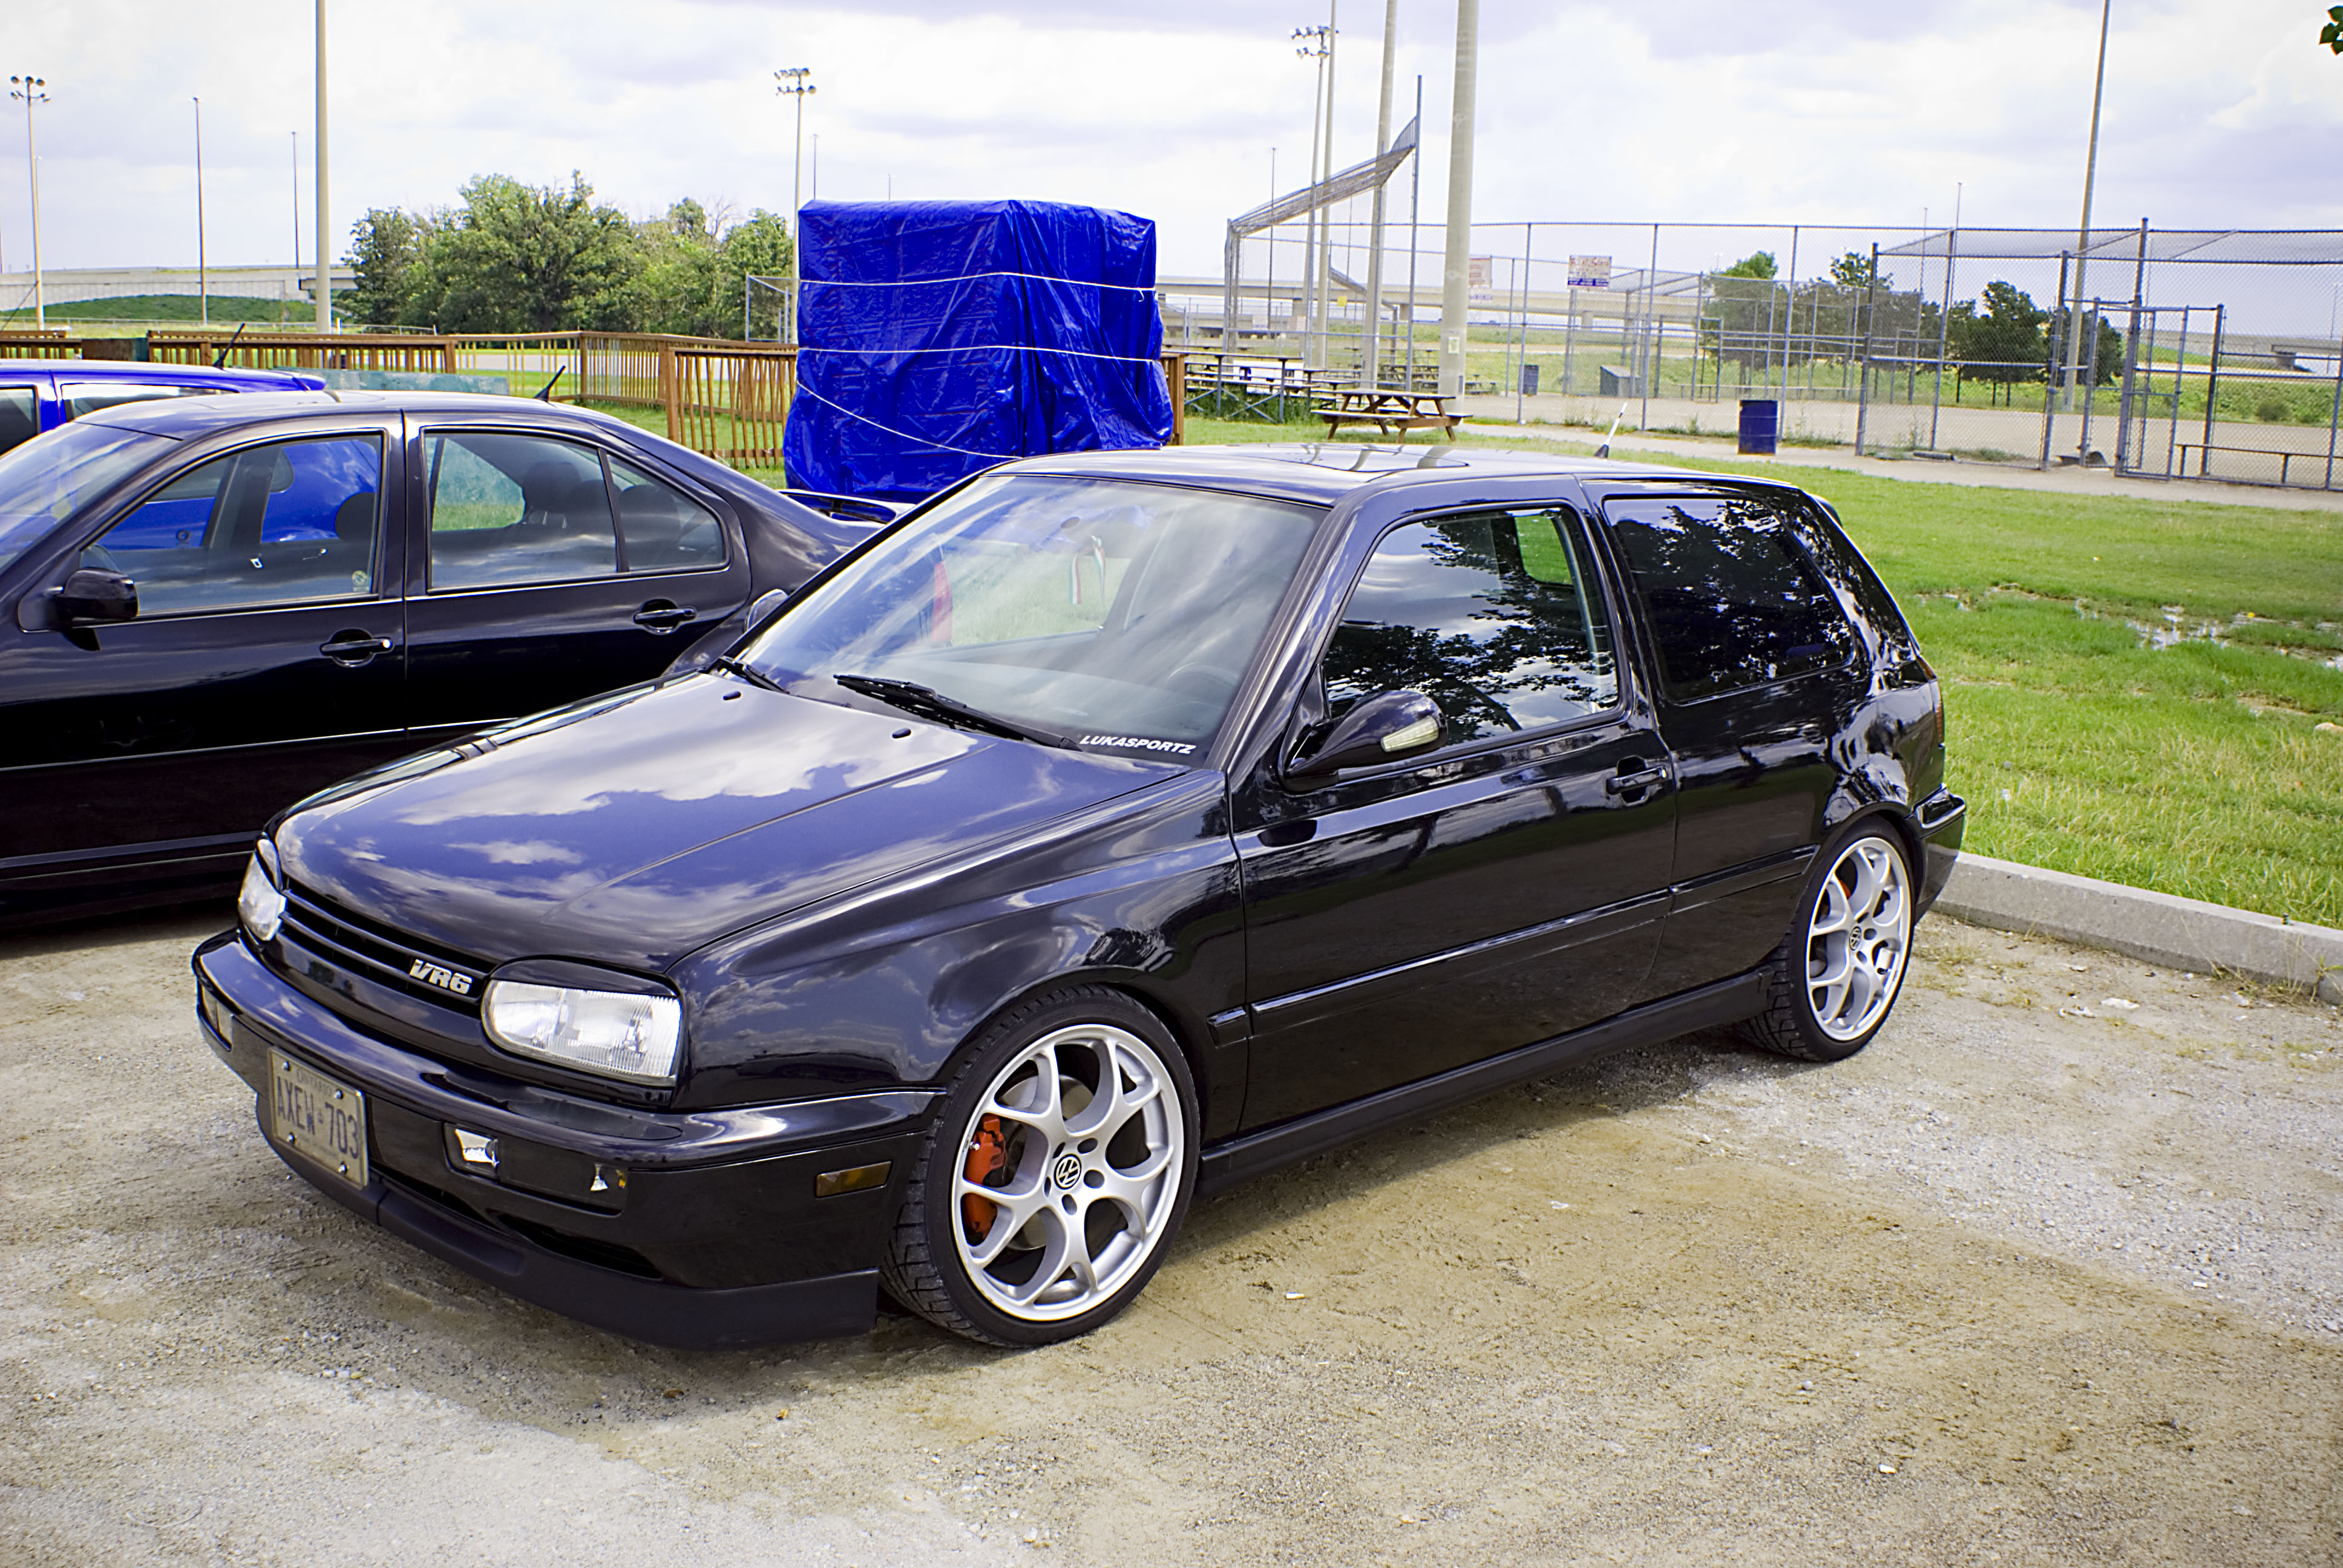 Volkswagen Gti Vr6 Specs >> Golf 3 Vr6. vw golf 3 vr6 sound accelerations onboard autobahn 0. vw golf 3 vr6 acceleration 0 ...